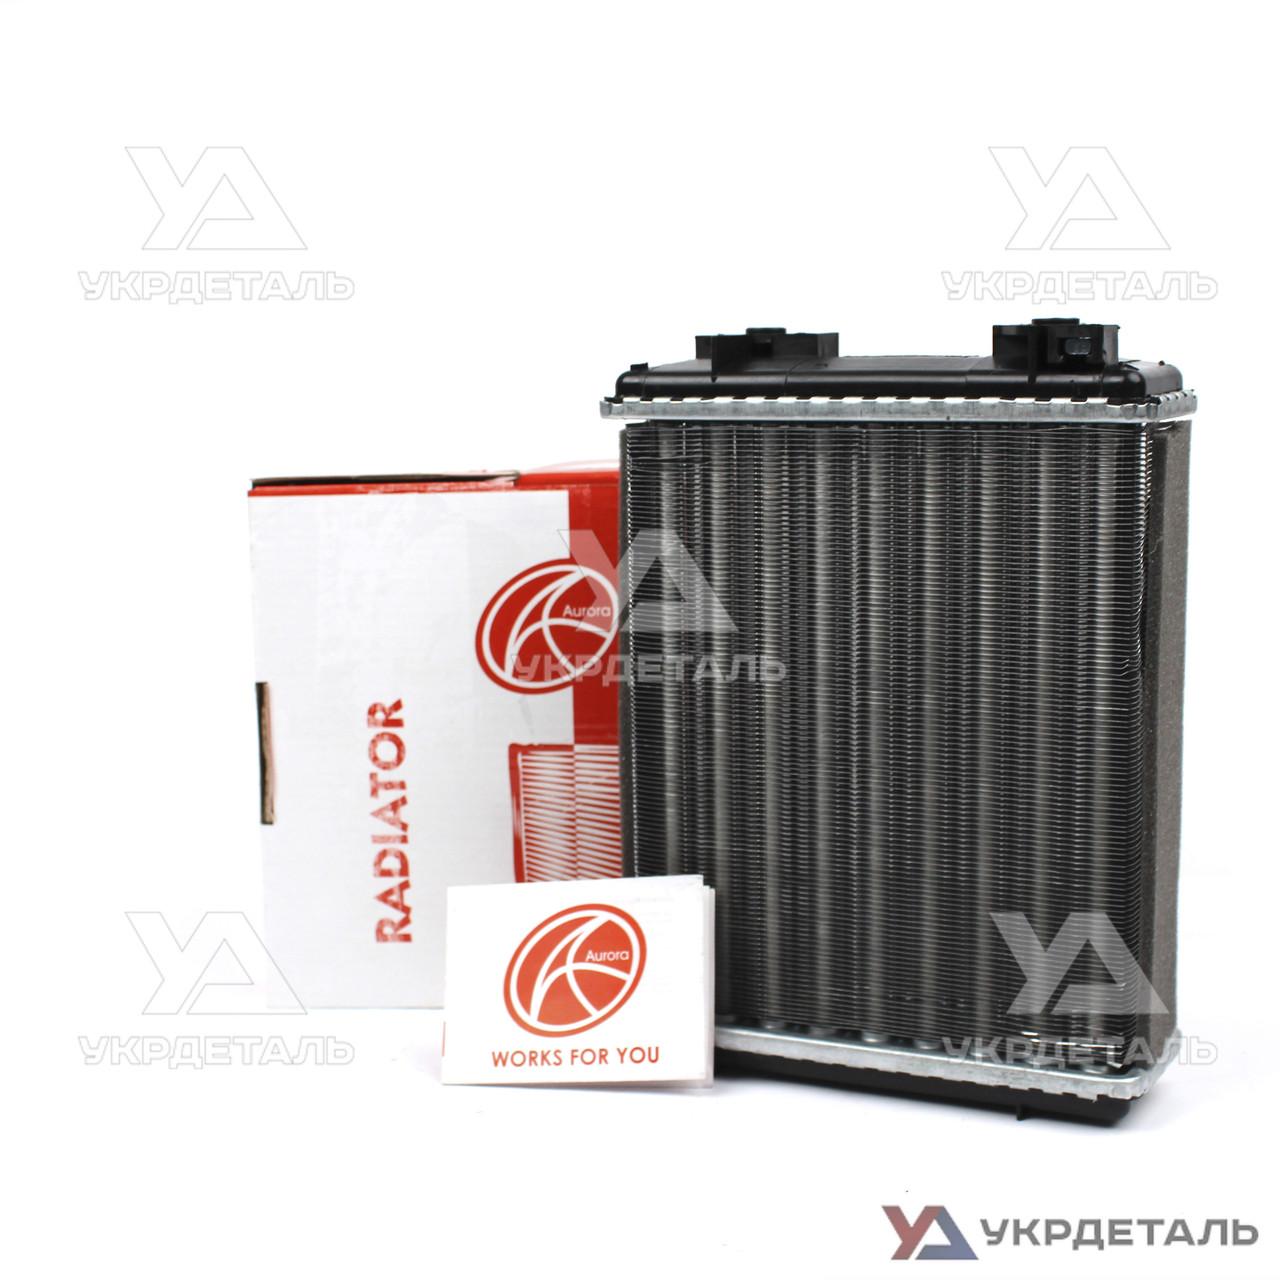 Радиатор отопителя (печки) ВАЗ-2101, 21011, 2102, 2103, 2104, 2105, 2106, 2107 | 2101-8101060 (AURORA)